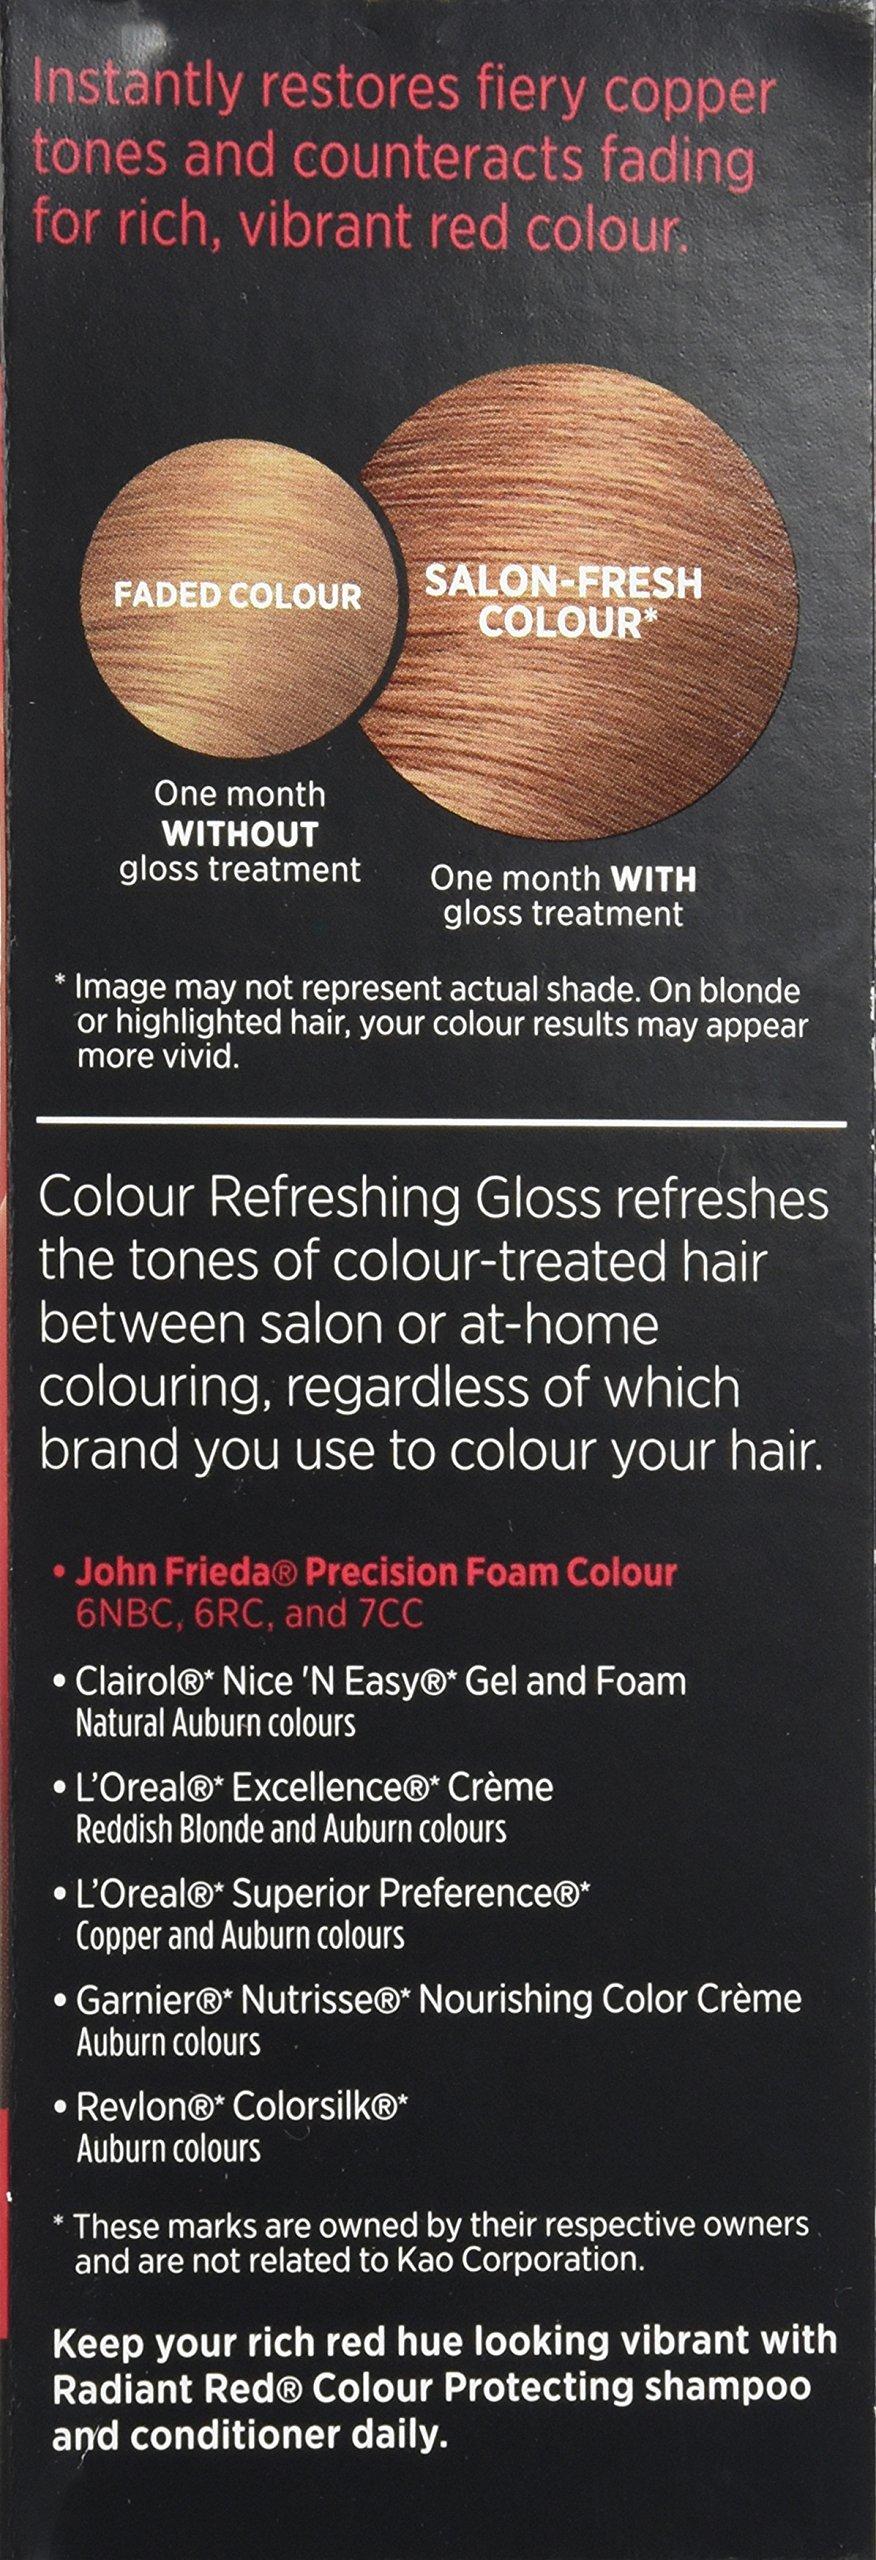 John Frieda Colour Refreshing Gloss, Warm Red, 6 Ounce by John Frieda PFC (Image #5)